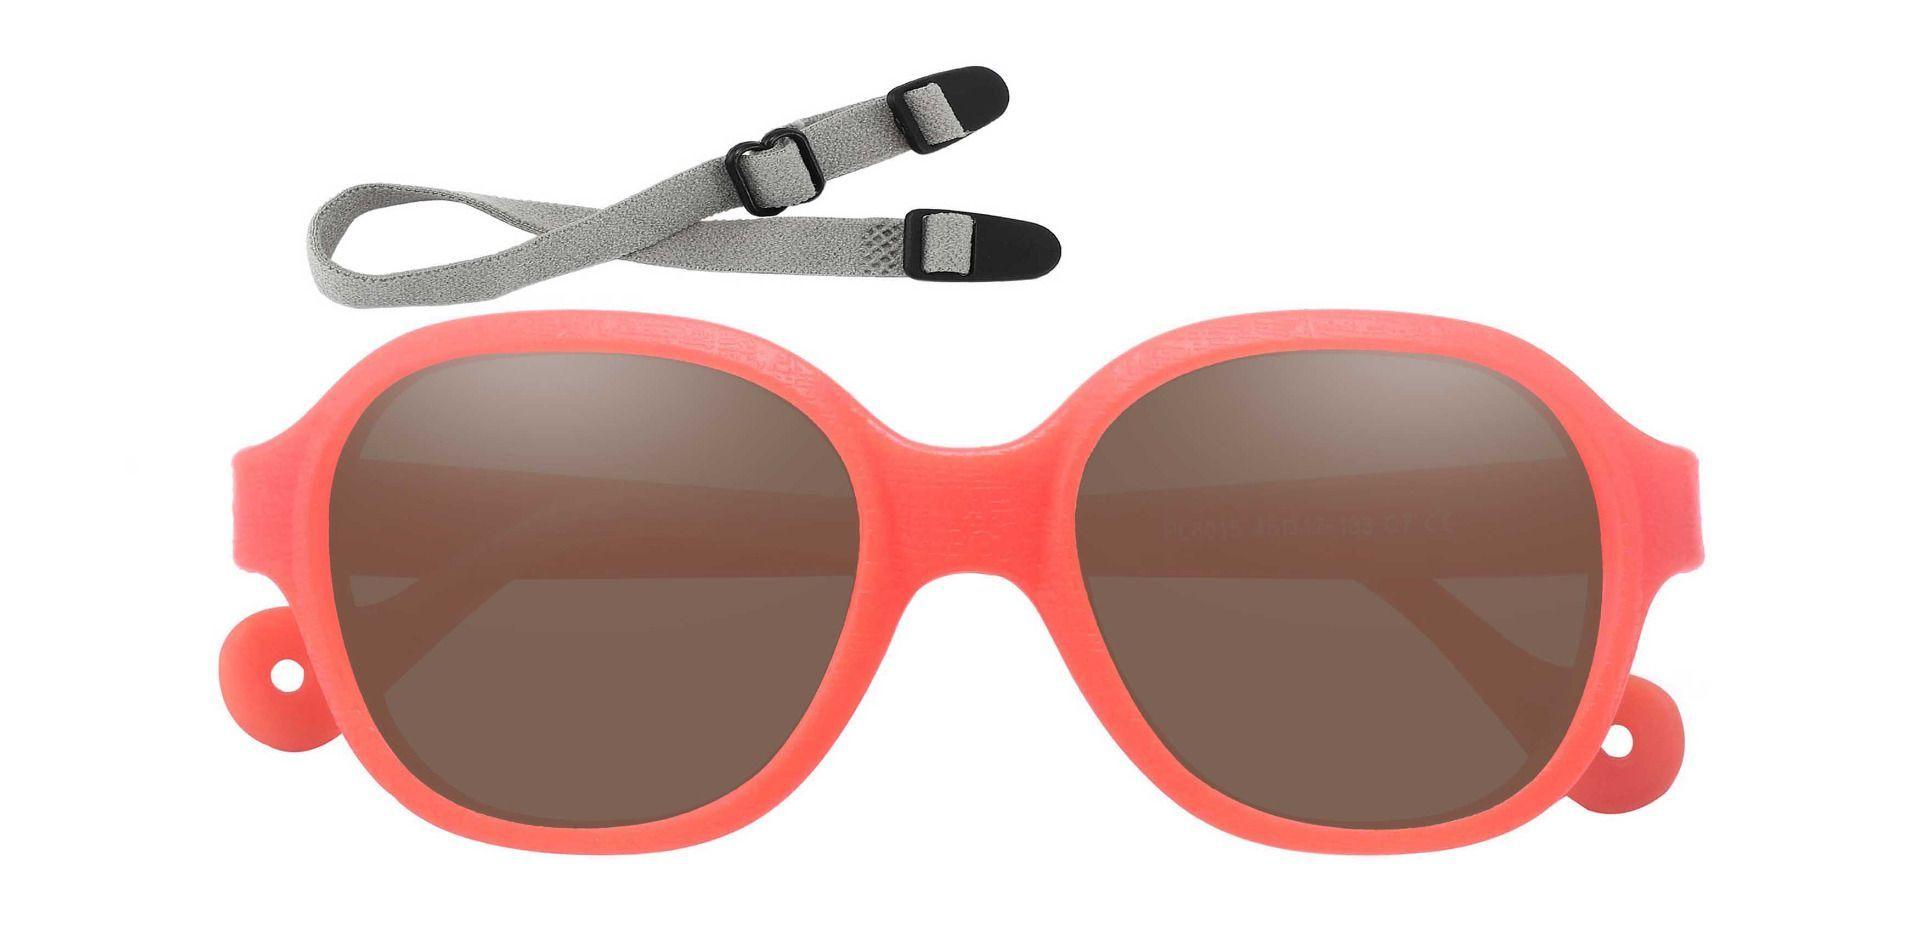 Oden Oval Prescription Sunglasses - Orange Frame With Brown Lenses